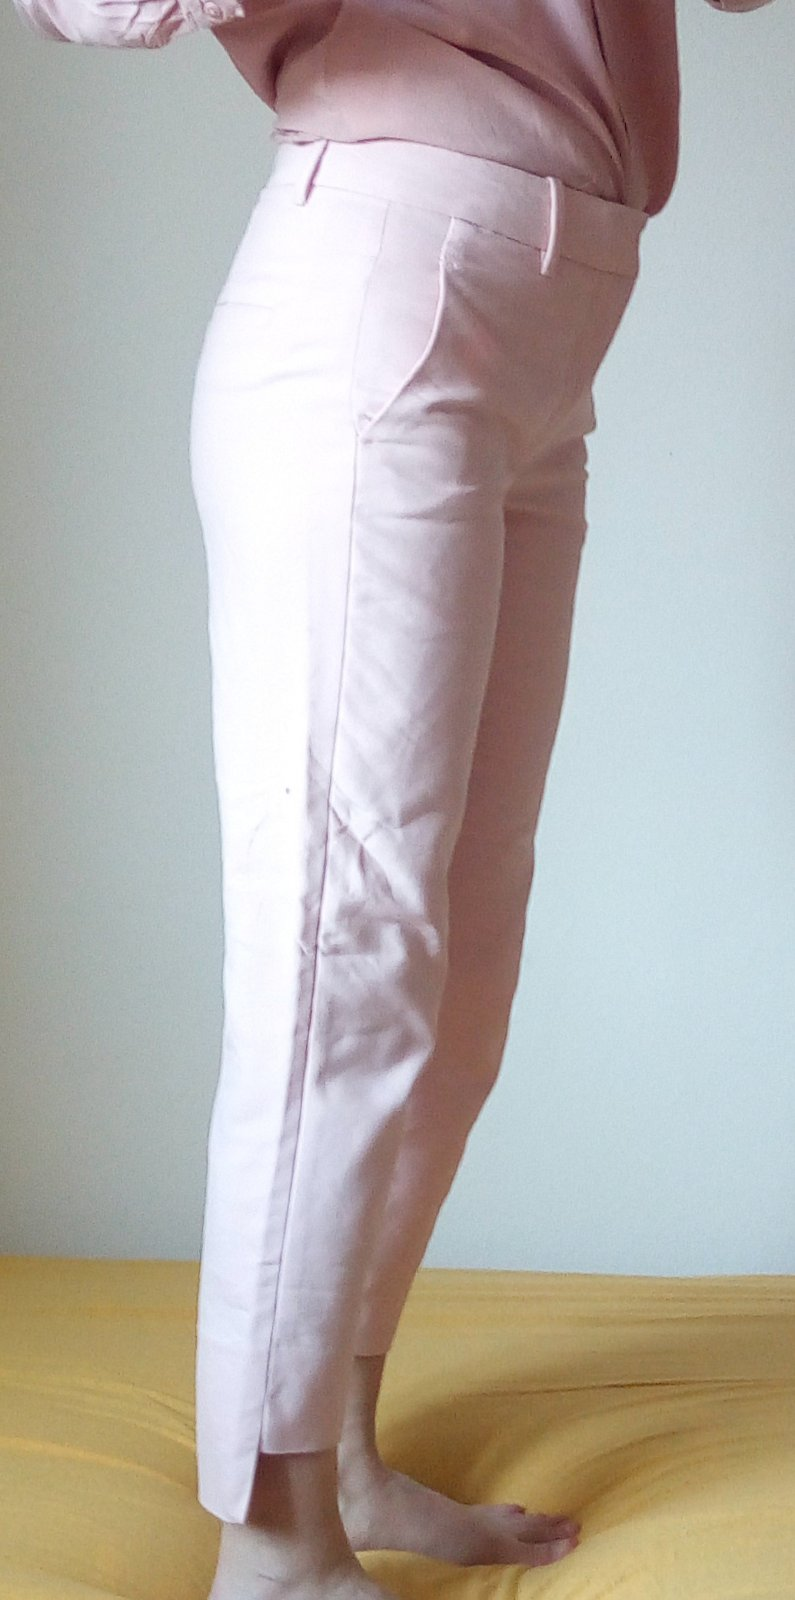 Bledoružové nohavice Zara S - Obrázok č. 2